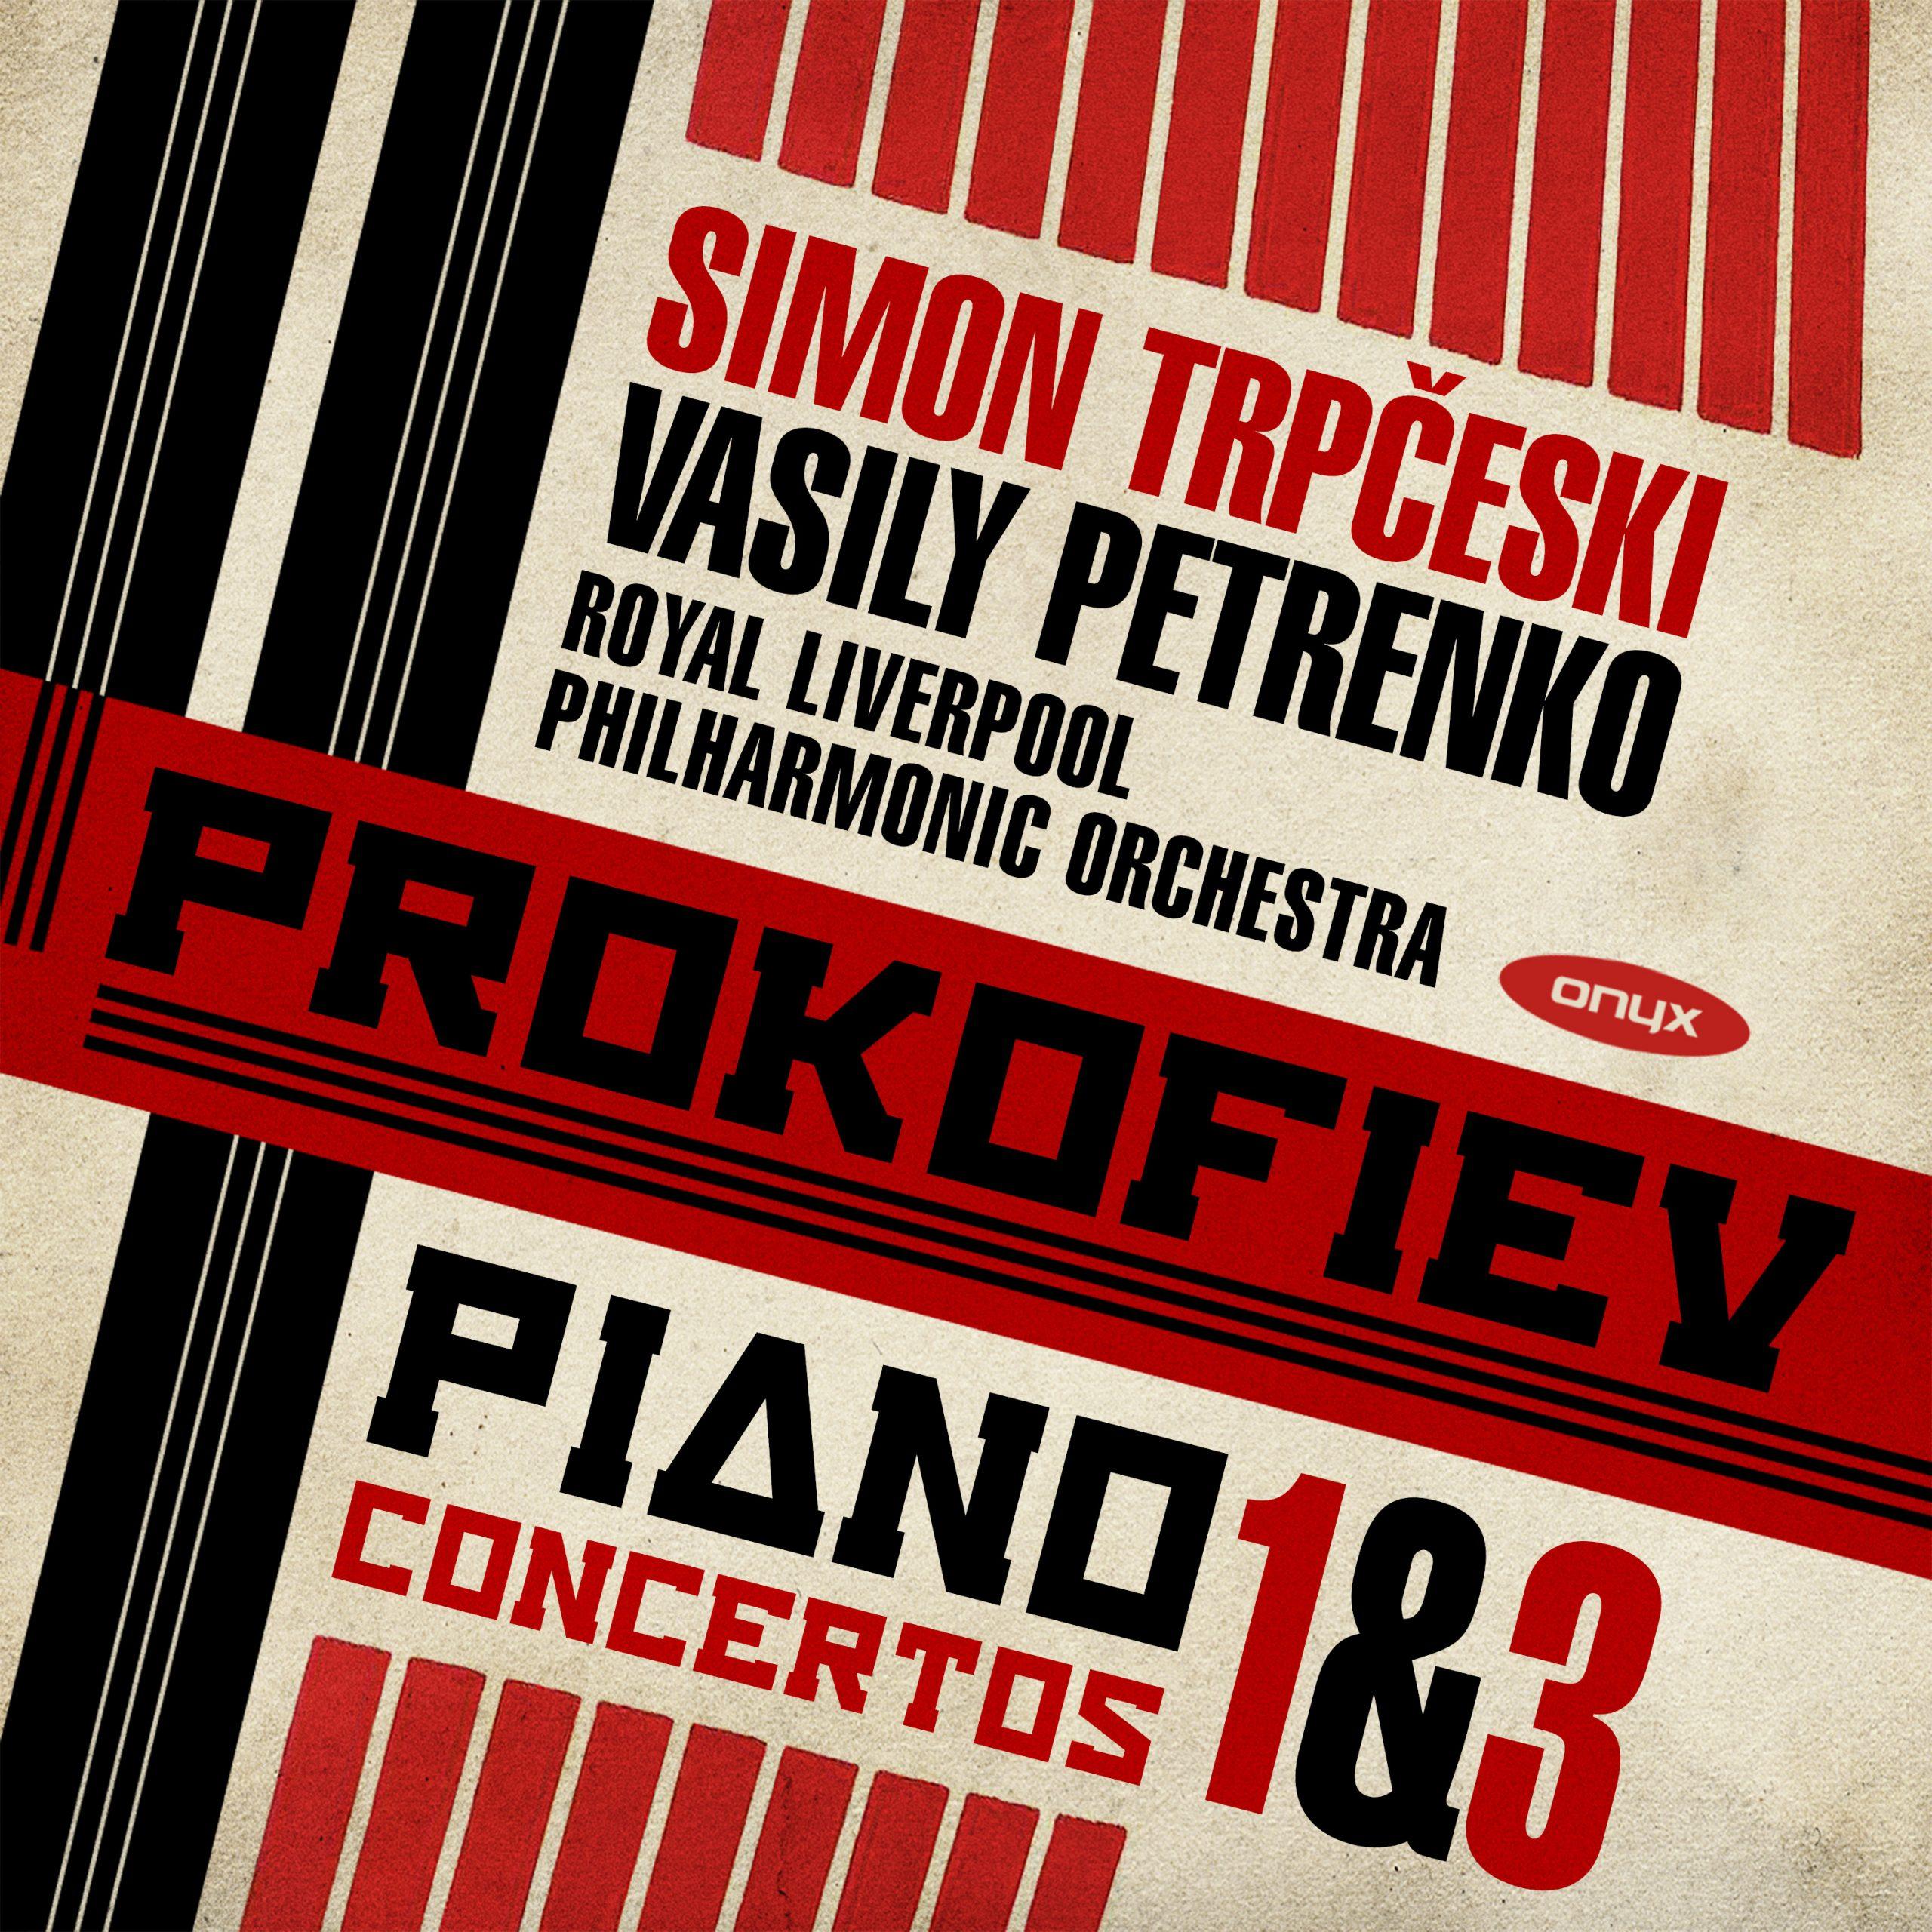 448Prokofiev, Sergei